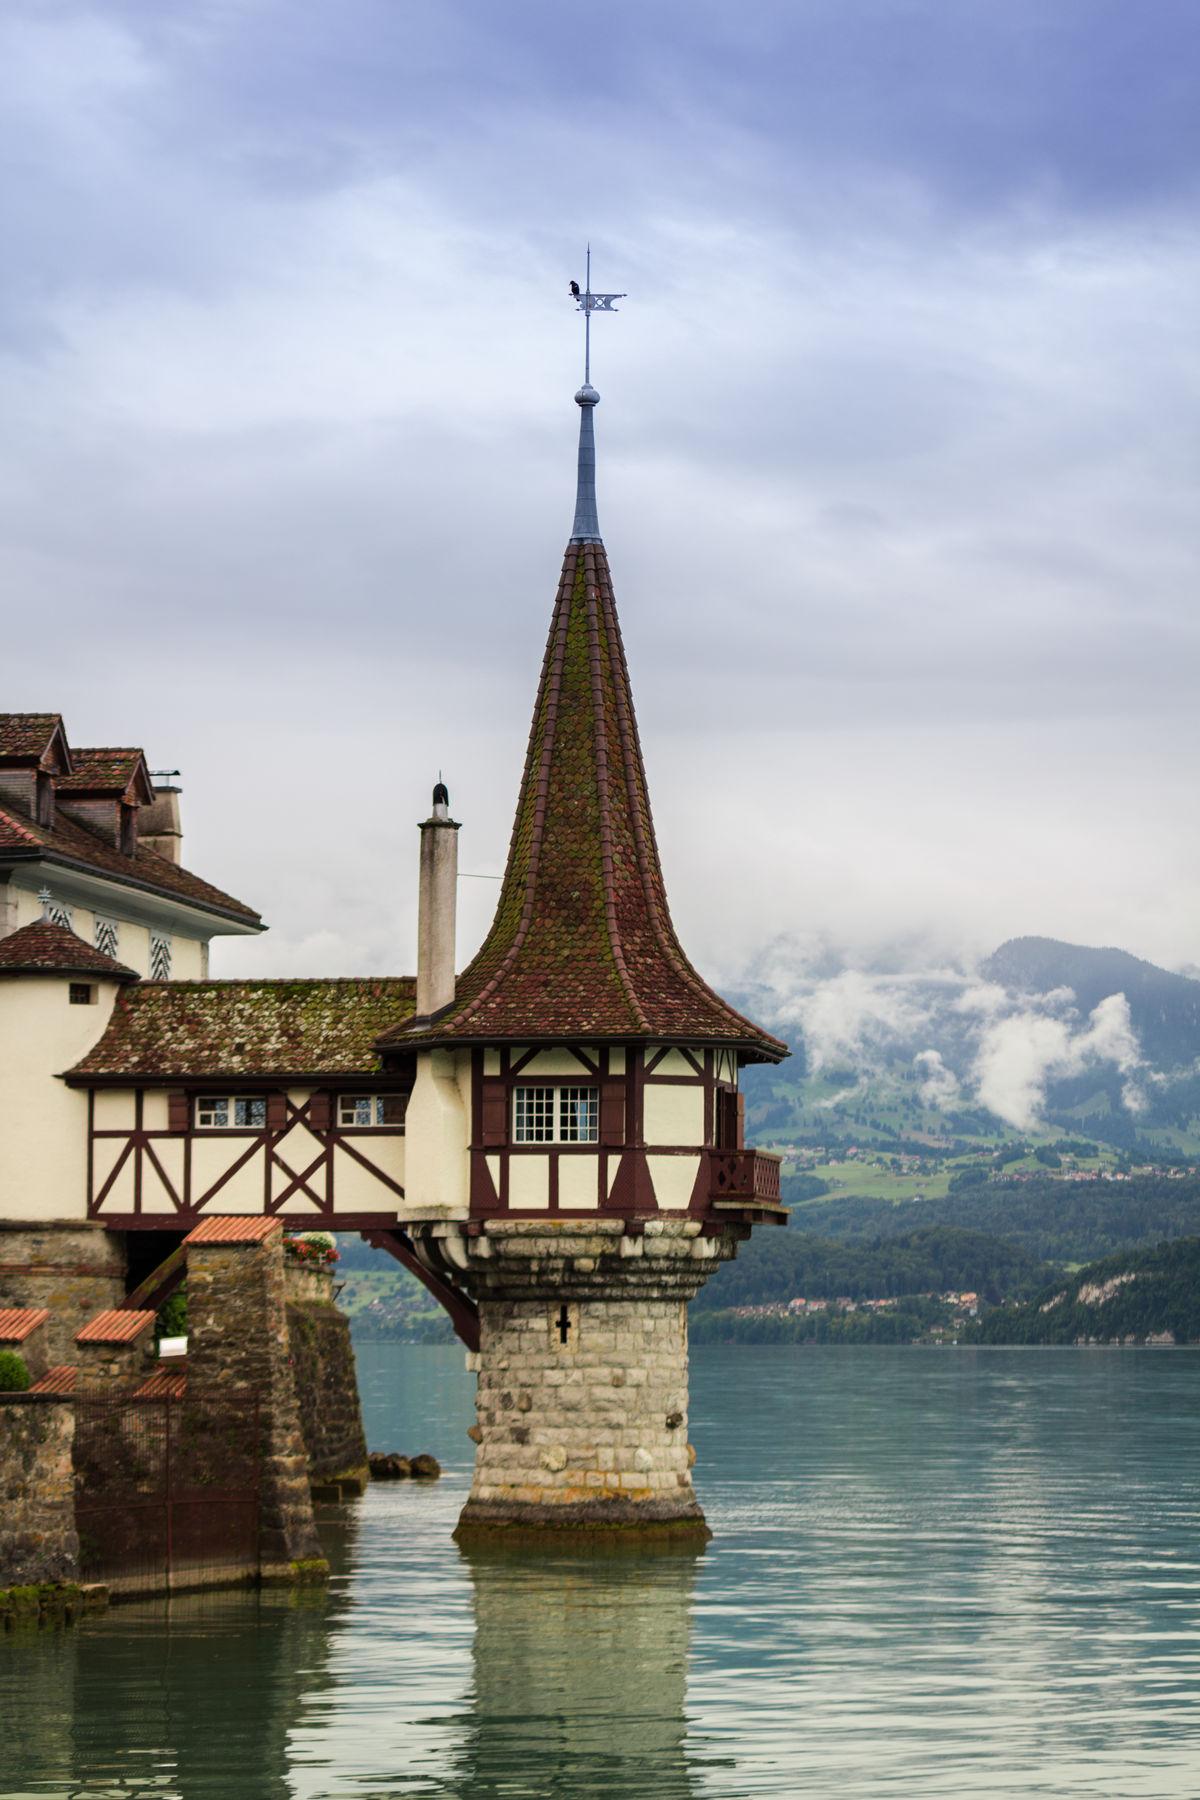 Schloss Oberhofen, Switzerland Architecture Built Structure Cloud Cloud - Sky Cloudy Day Nature No People Outdoors Overcast Rippled Schloss Oberhofen Sky Tourism Tower Tranquility Travel Destinations Water